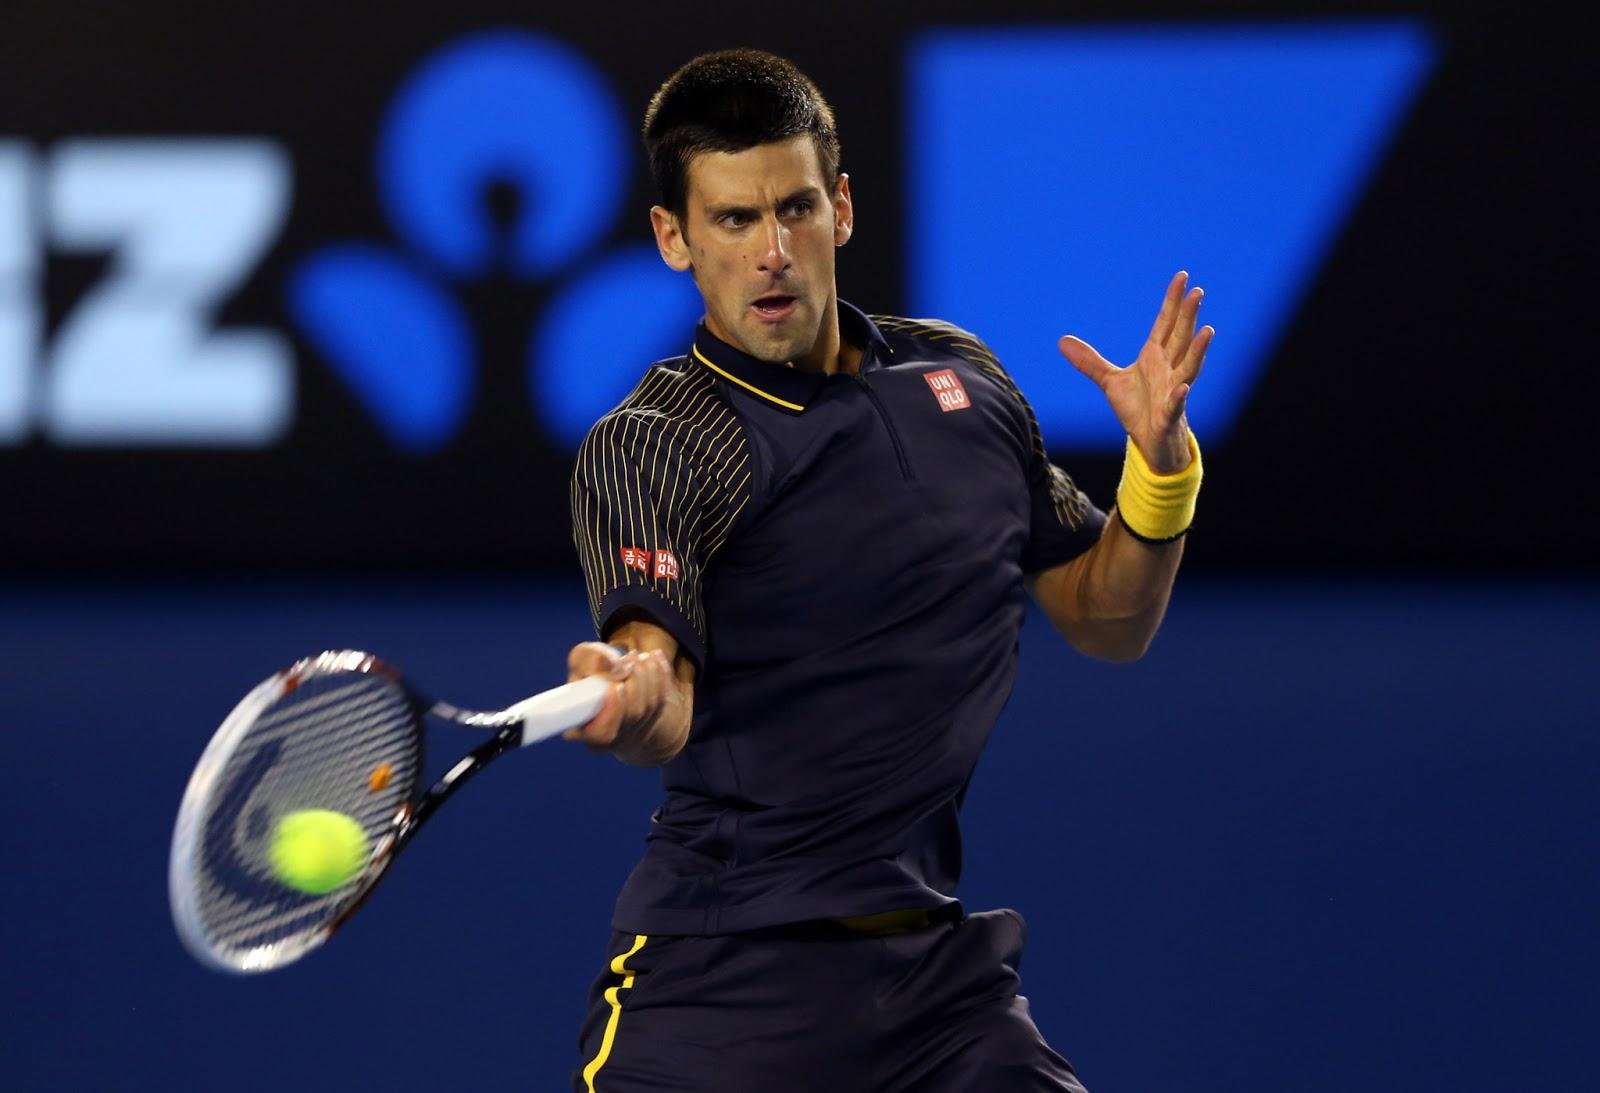 Download Novak Djokovic HD Wallpaper 2013 1600x1093